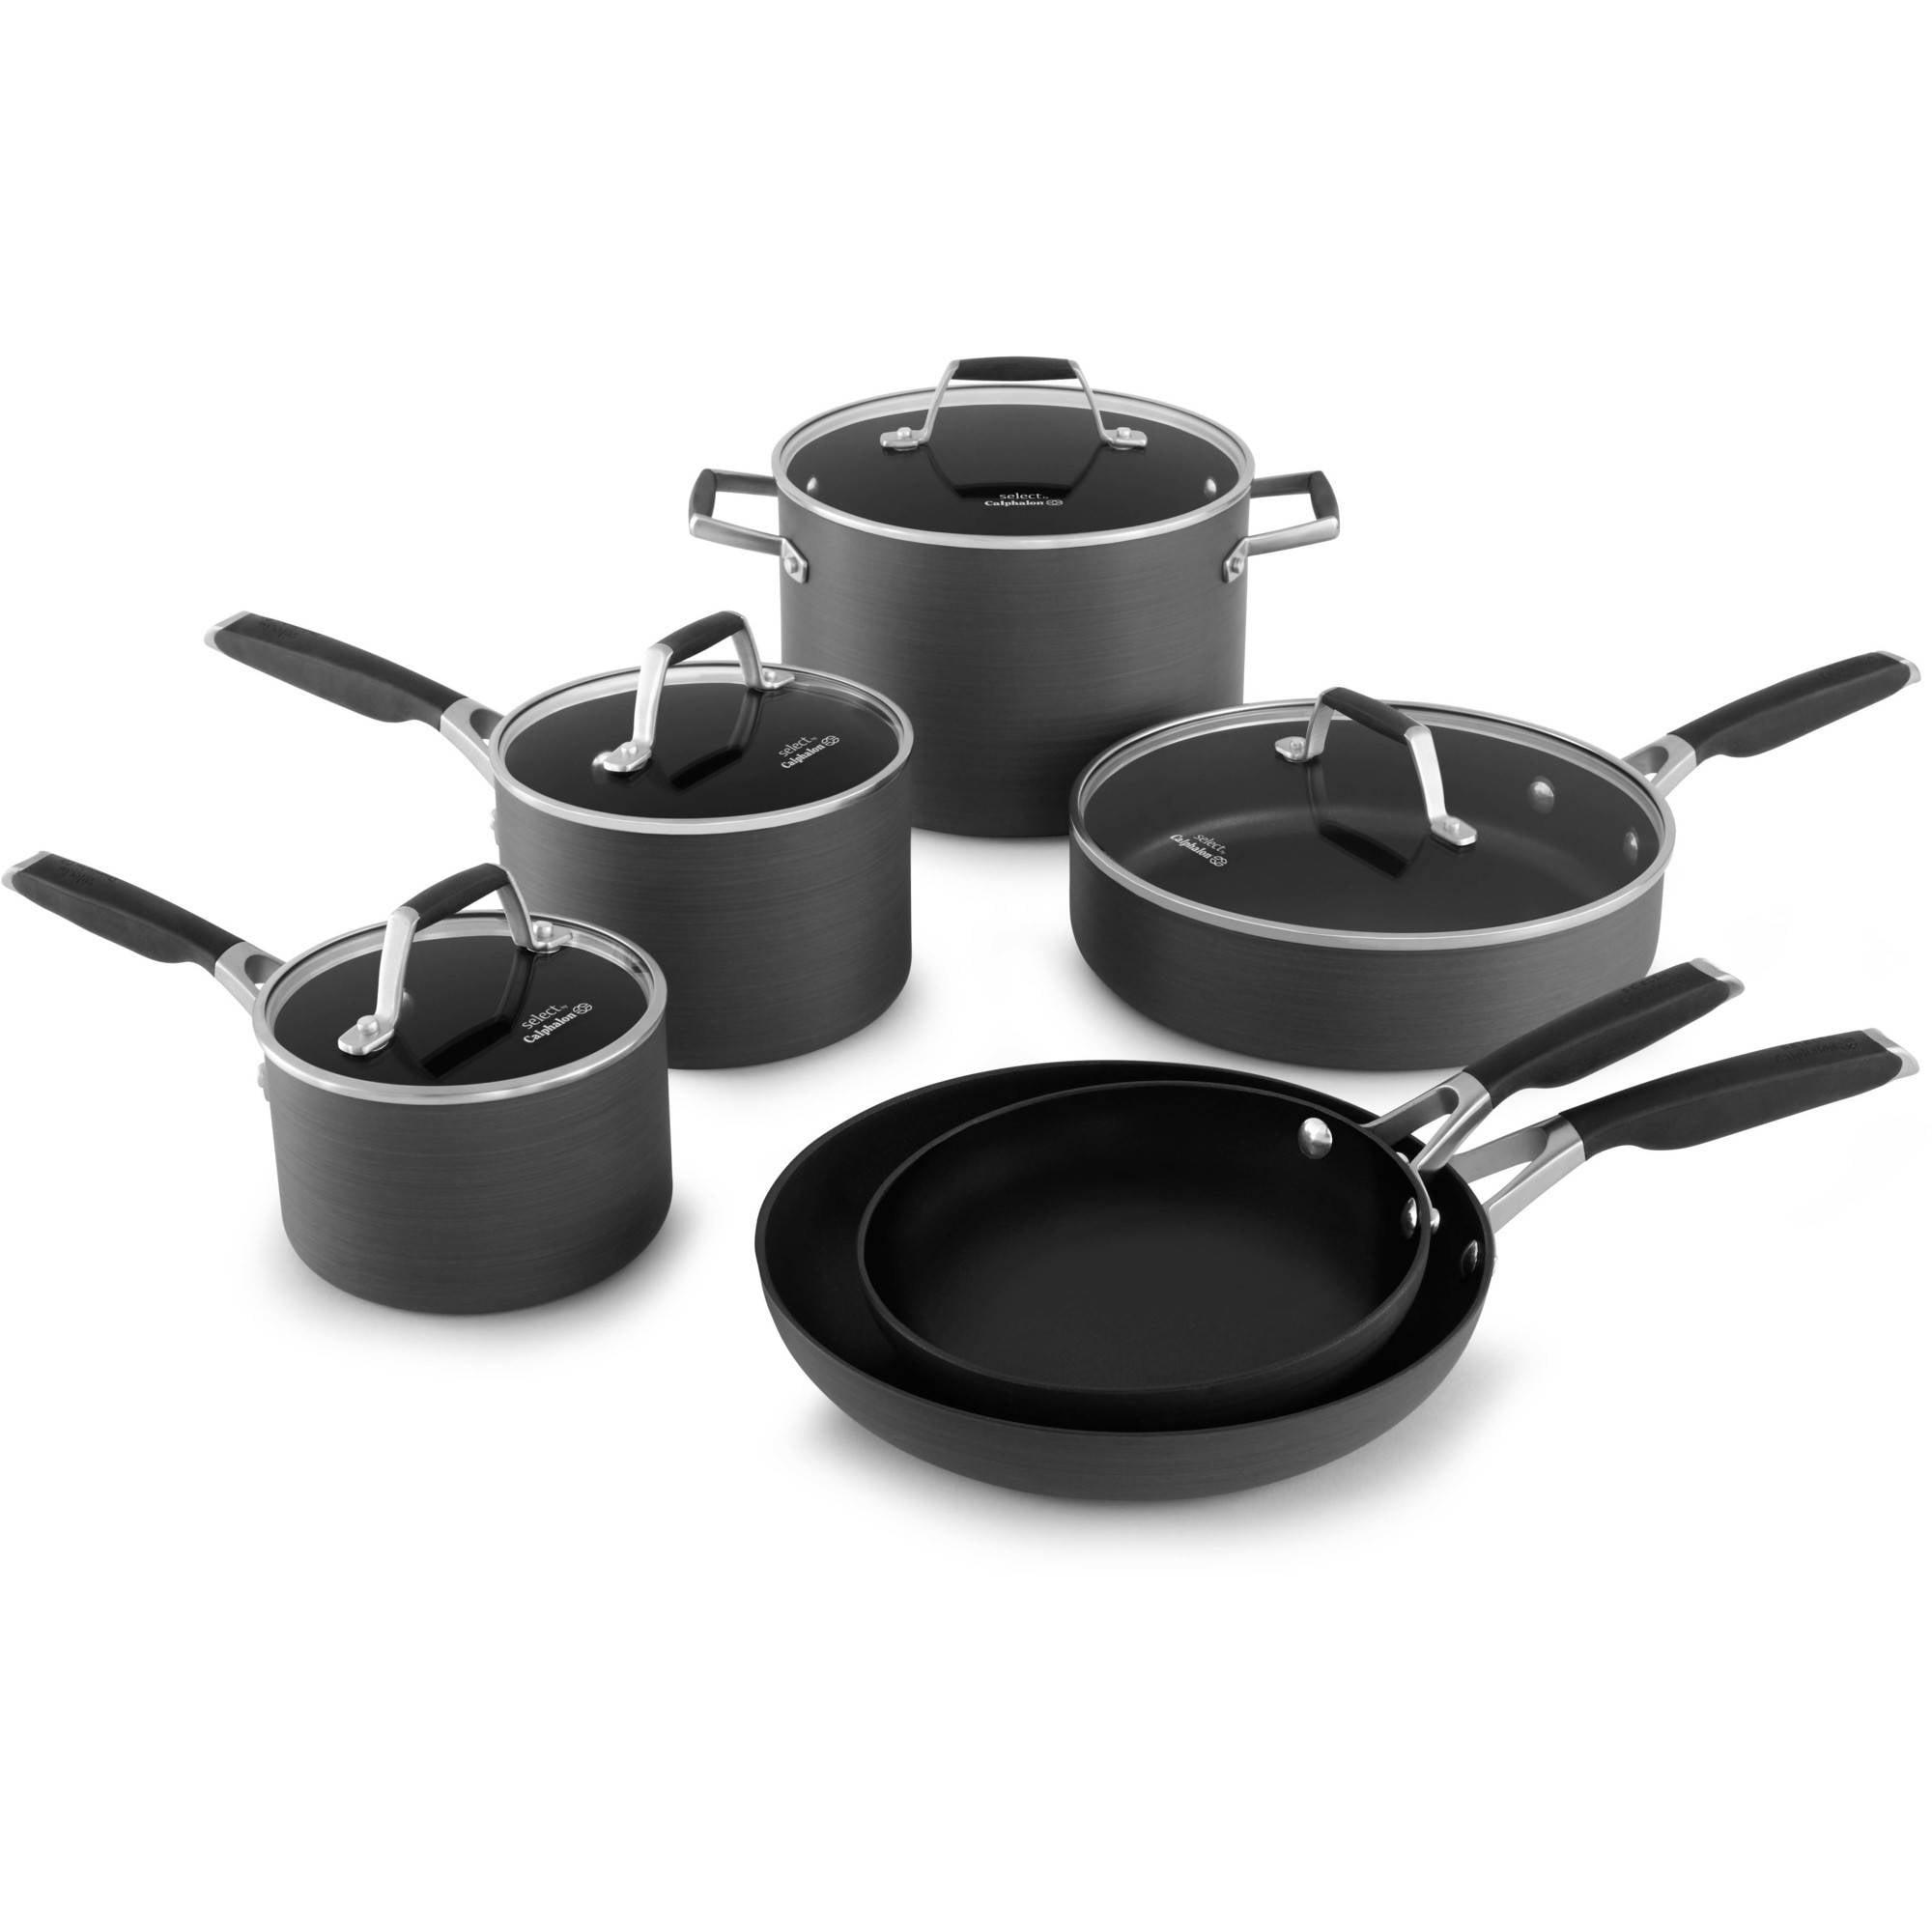 Select by Calphalon 10pc Hard-Anodized Non-Stick Cookware Set